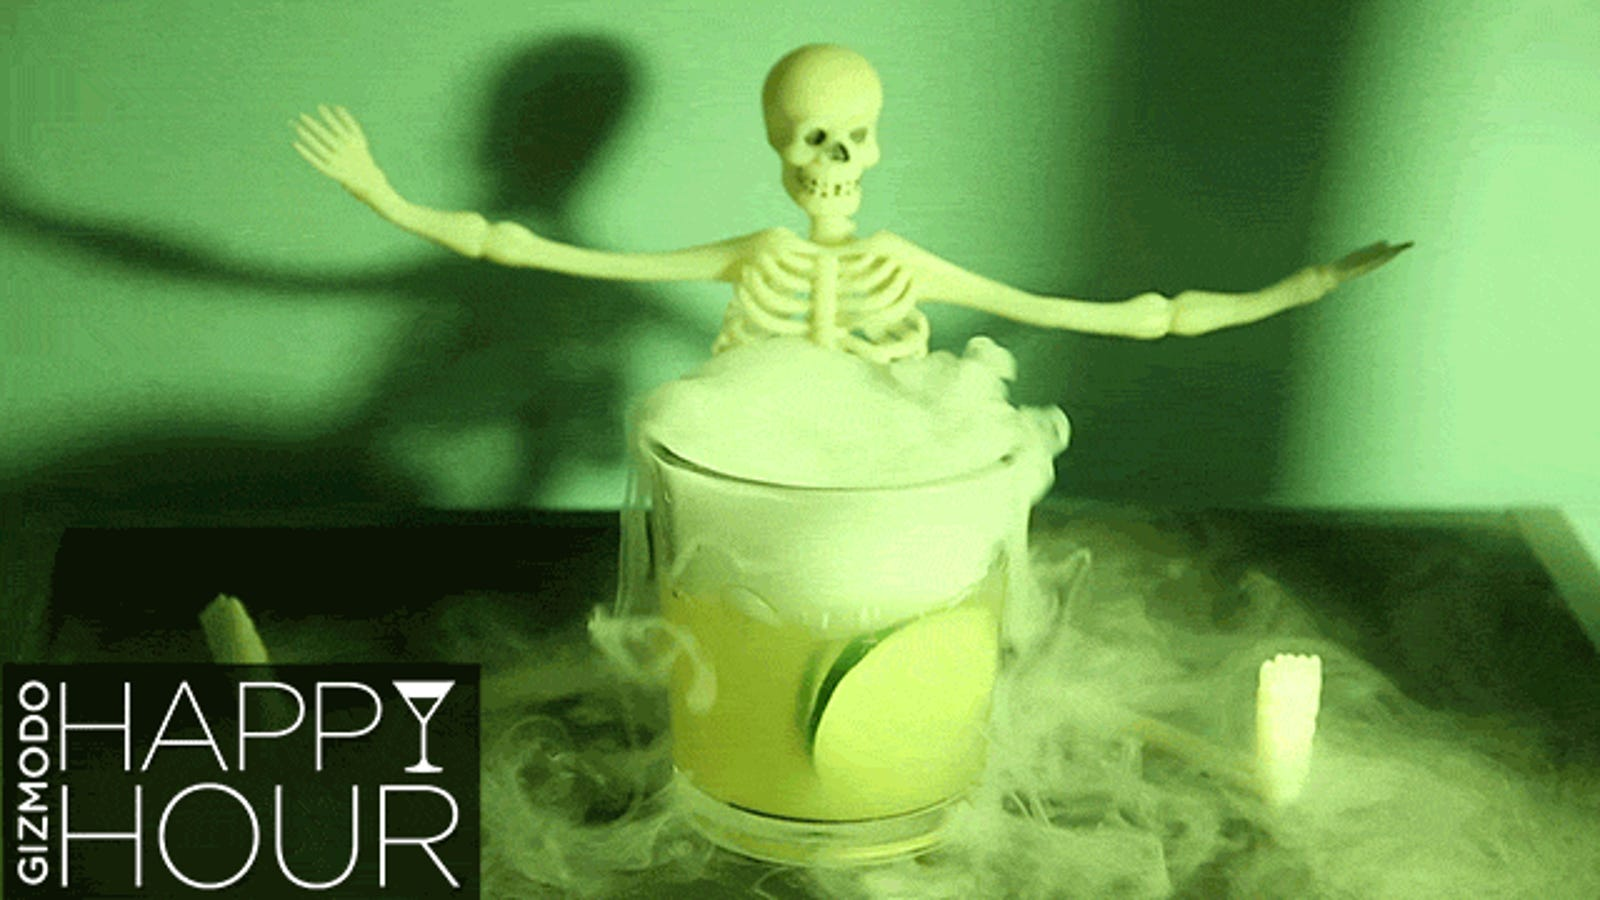 Halloween Cocktails + Dry Ice: A Spooky, Drunken Primer